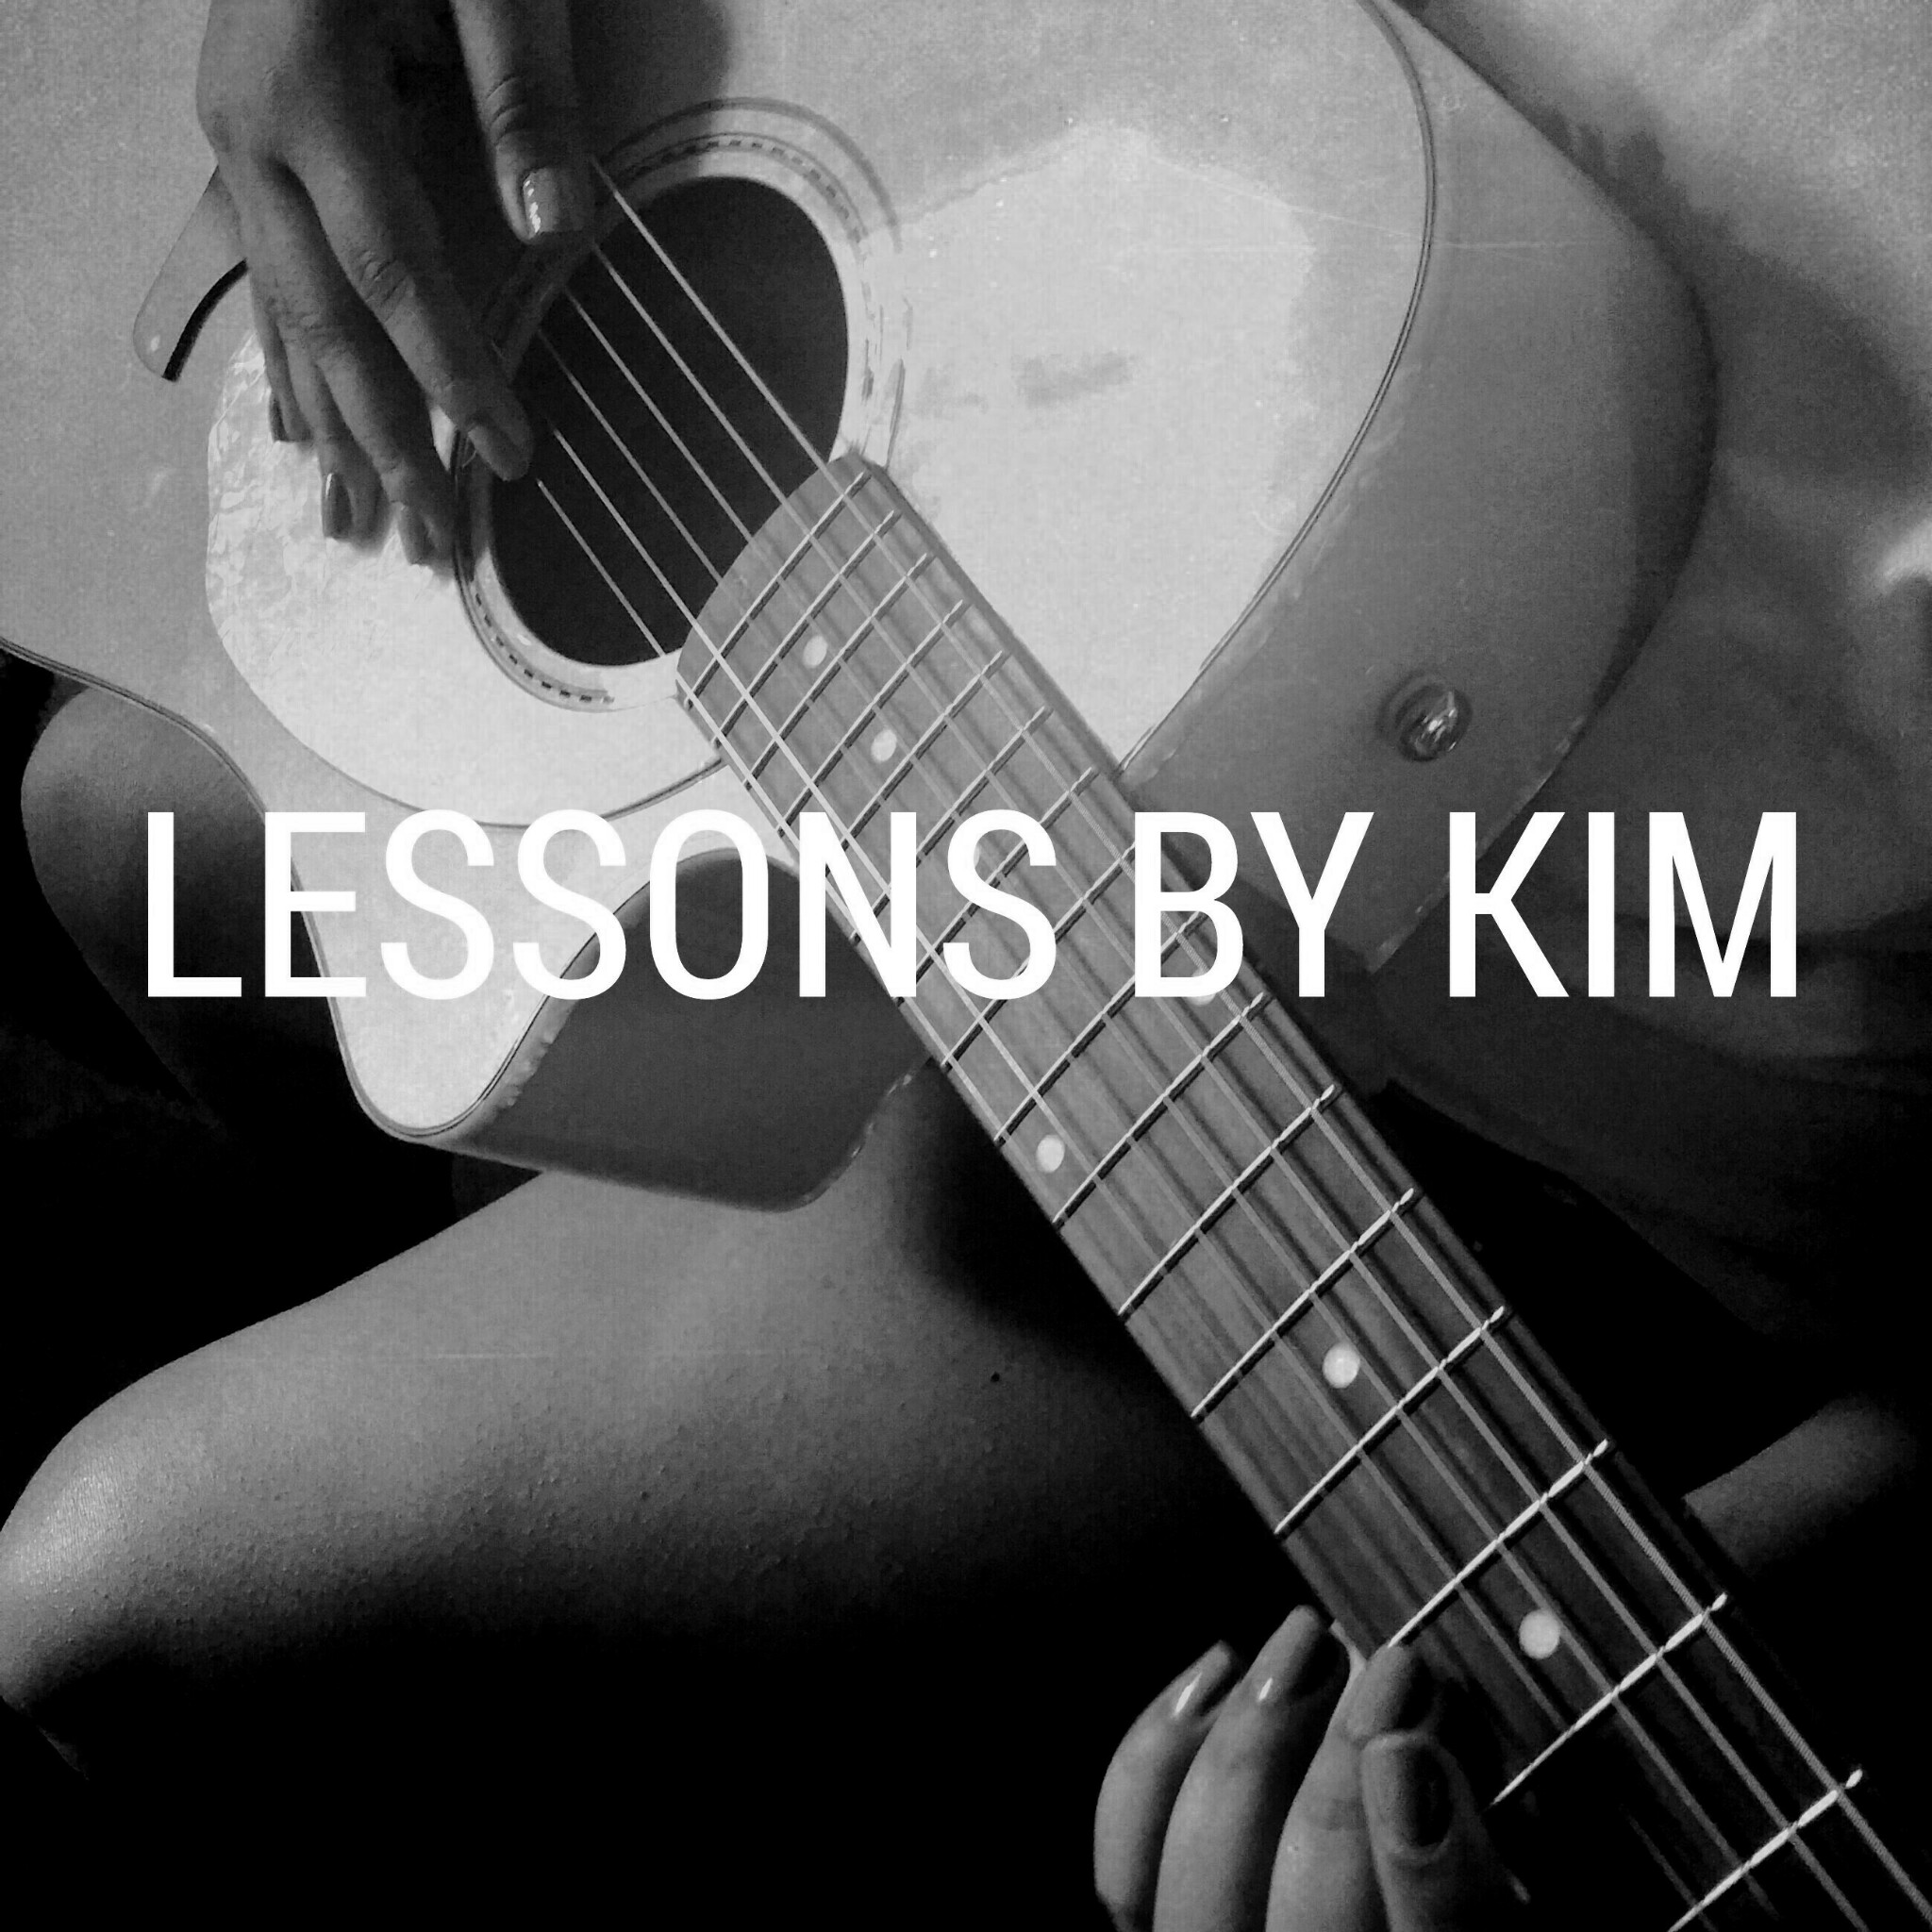 Lessons photo.jpg